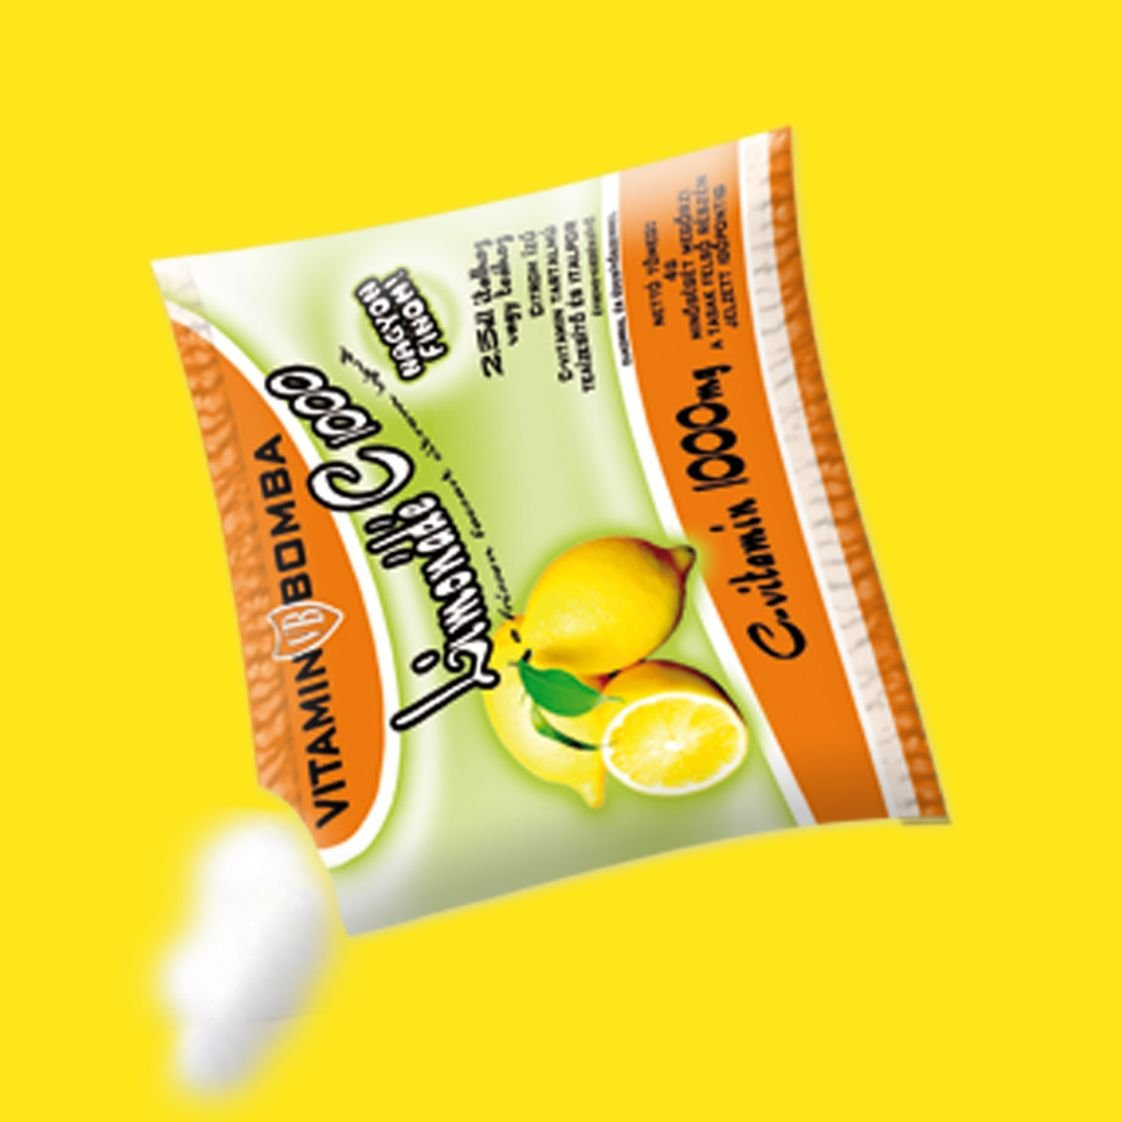 Vitamin Bomb C1000 instant lemon flavored drink powder